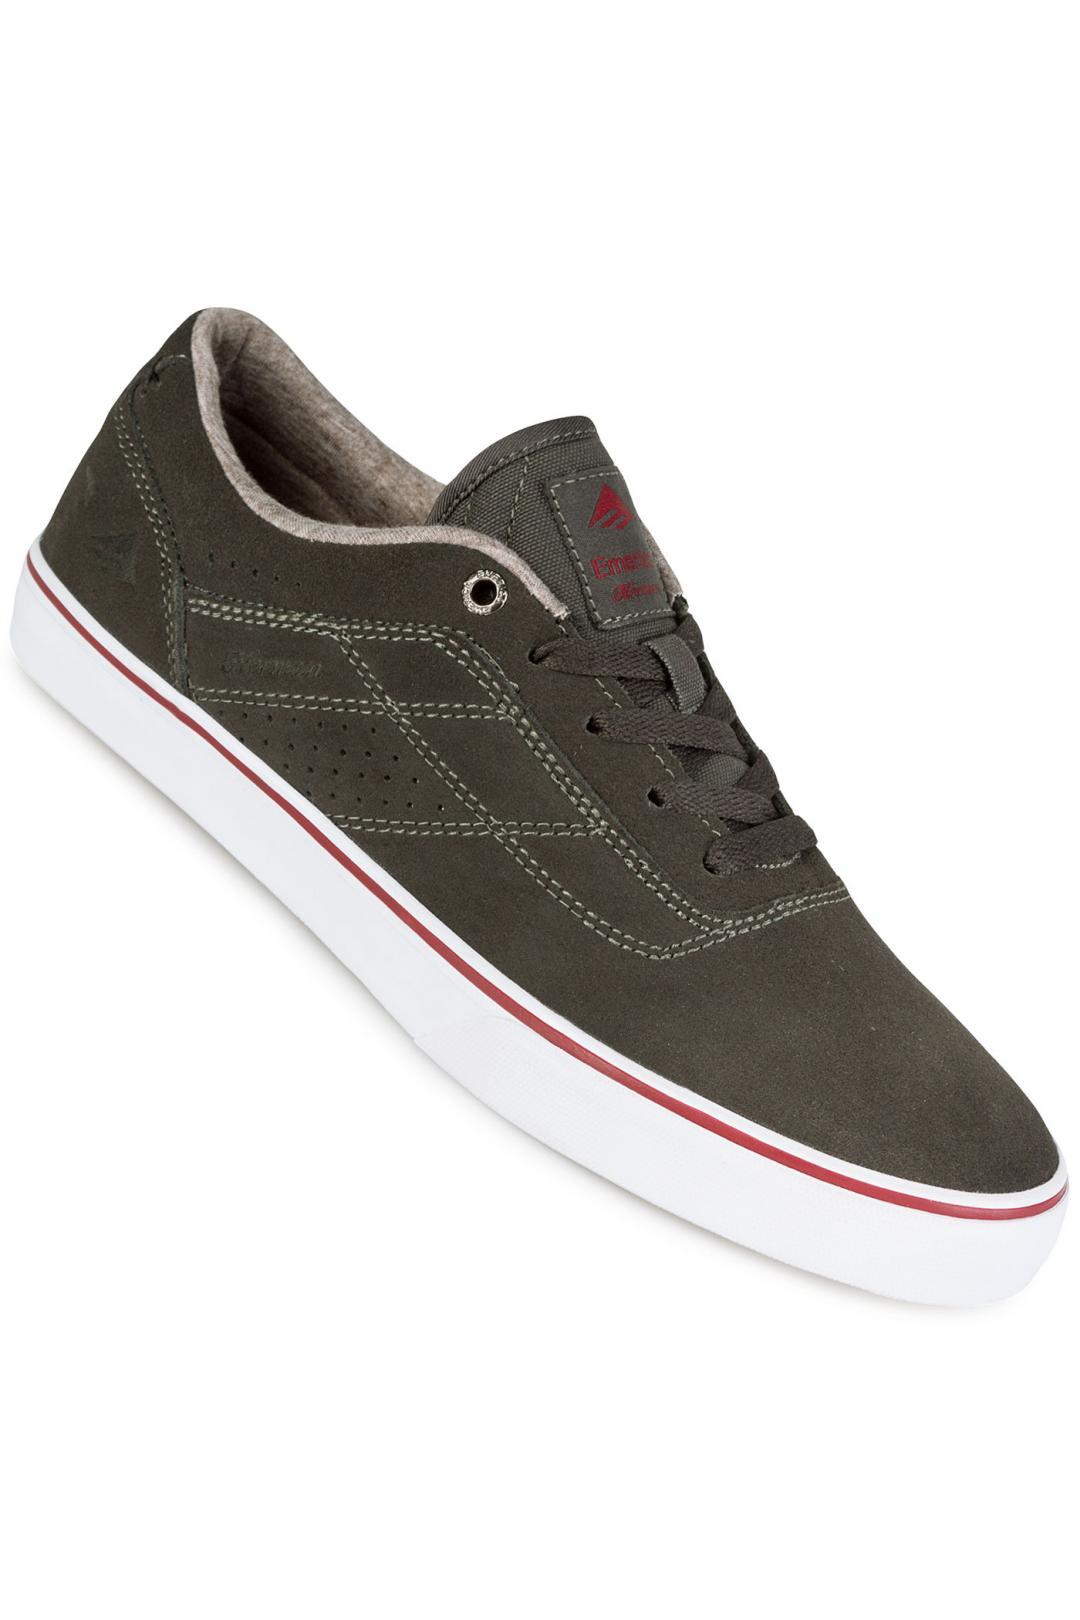 Uomo Emerica The Herman G6 Vulc dark grey red white | Sneakers low top